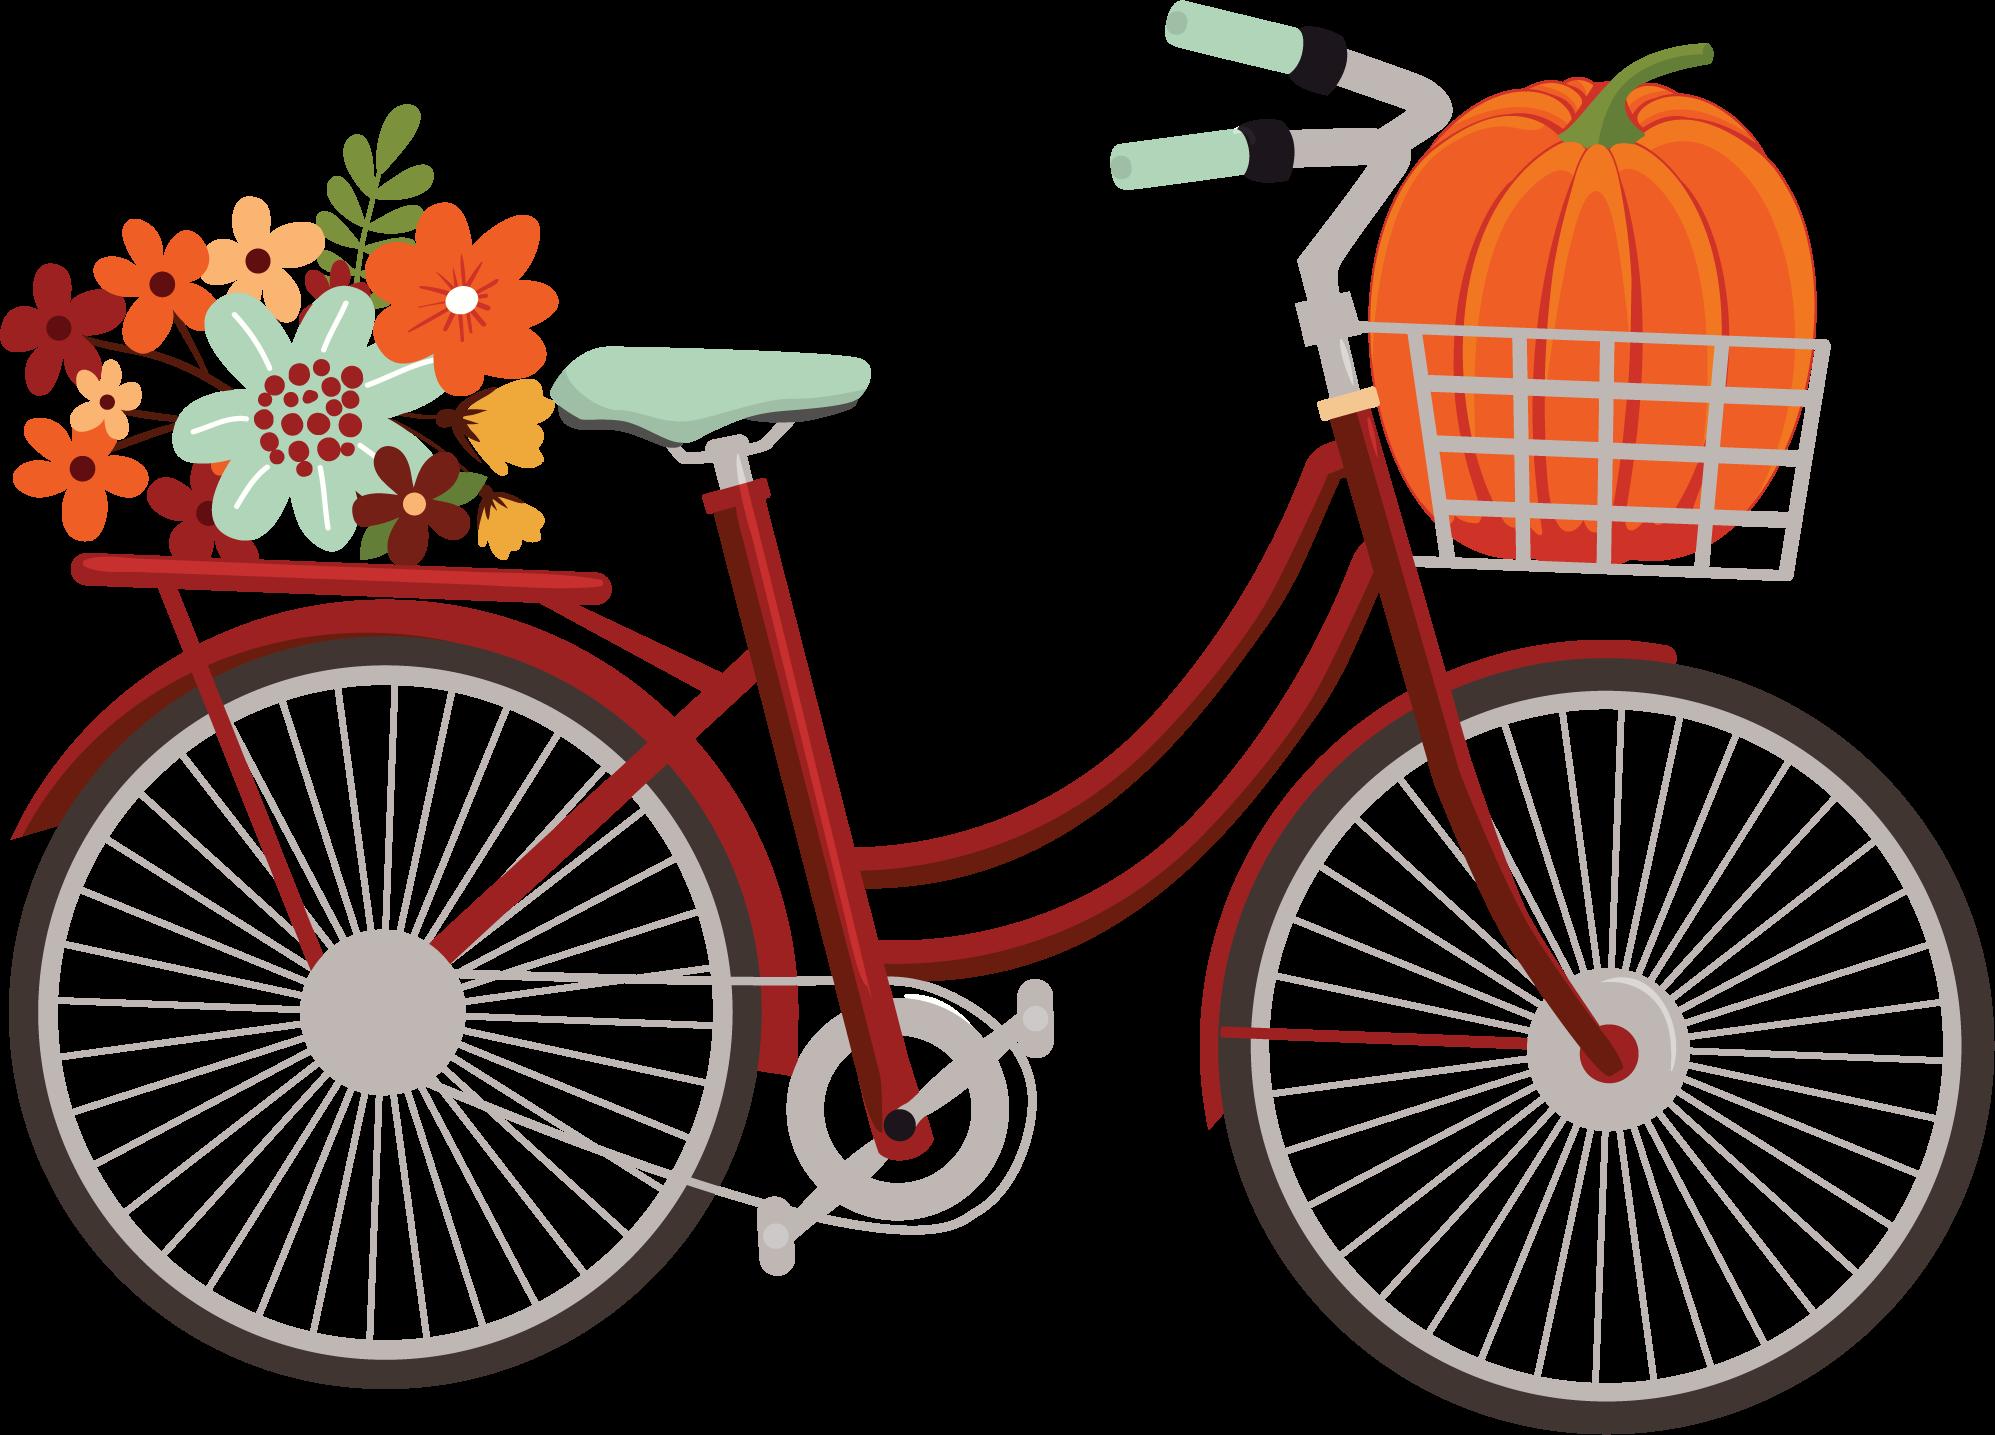 My Favorite Fall Bike Print & Cut File